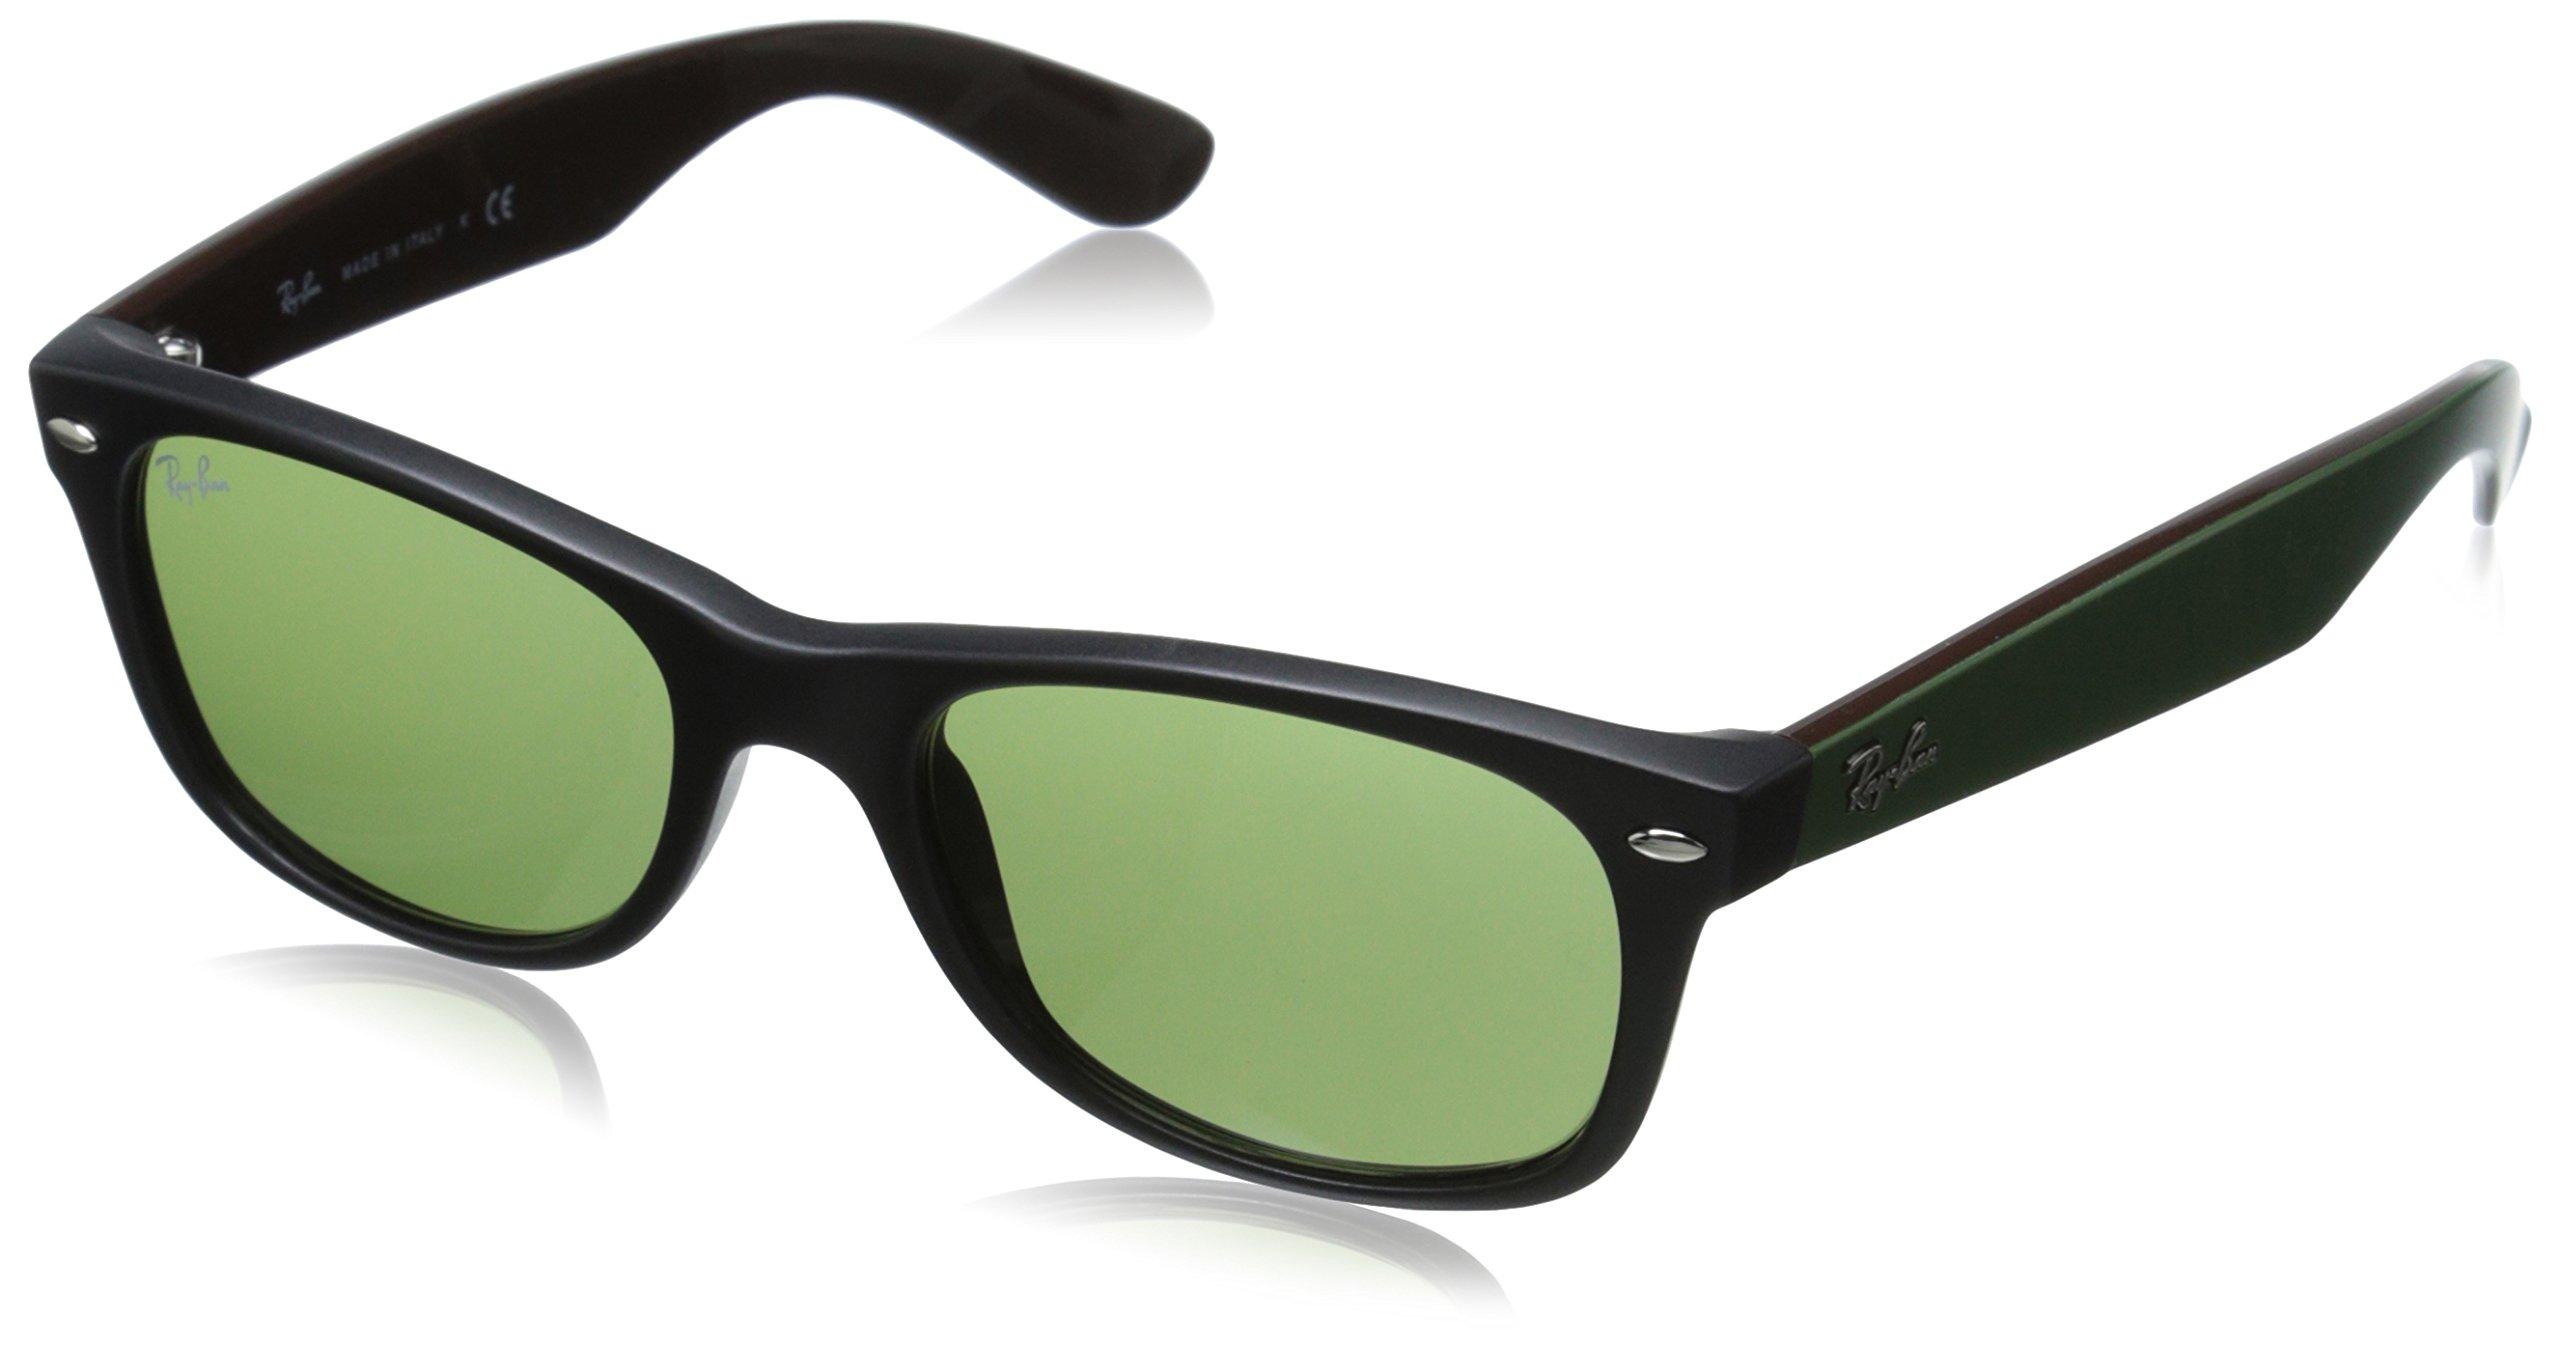 Ray-Ban RB2132 New Wayfarer Non Polarized Sunglasses, Matte Black, Green 52 mm